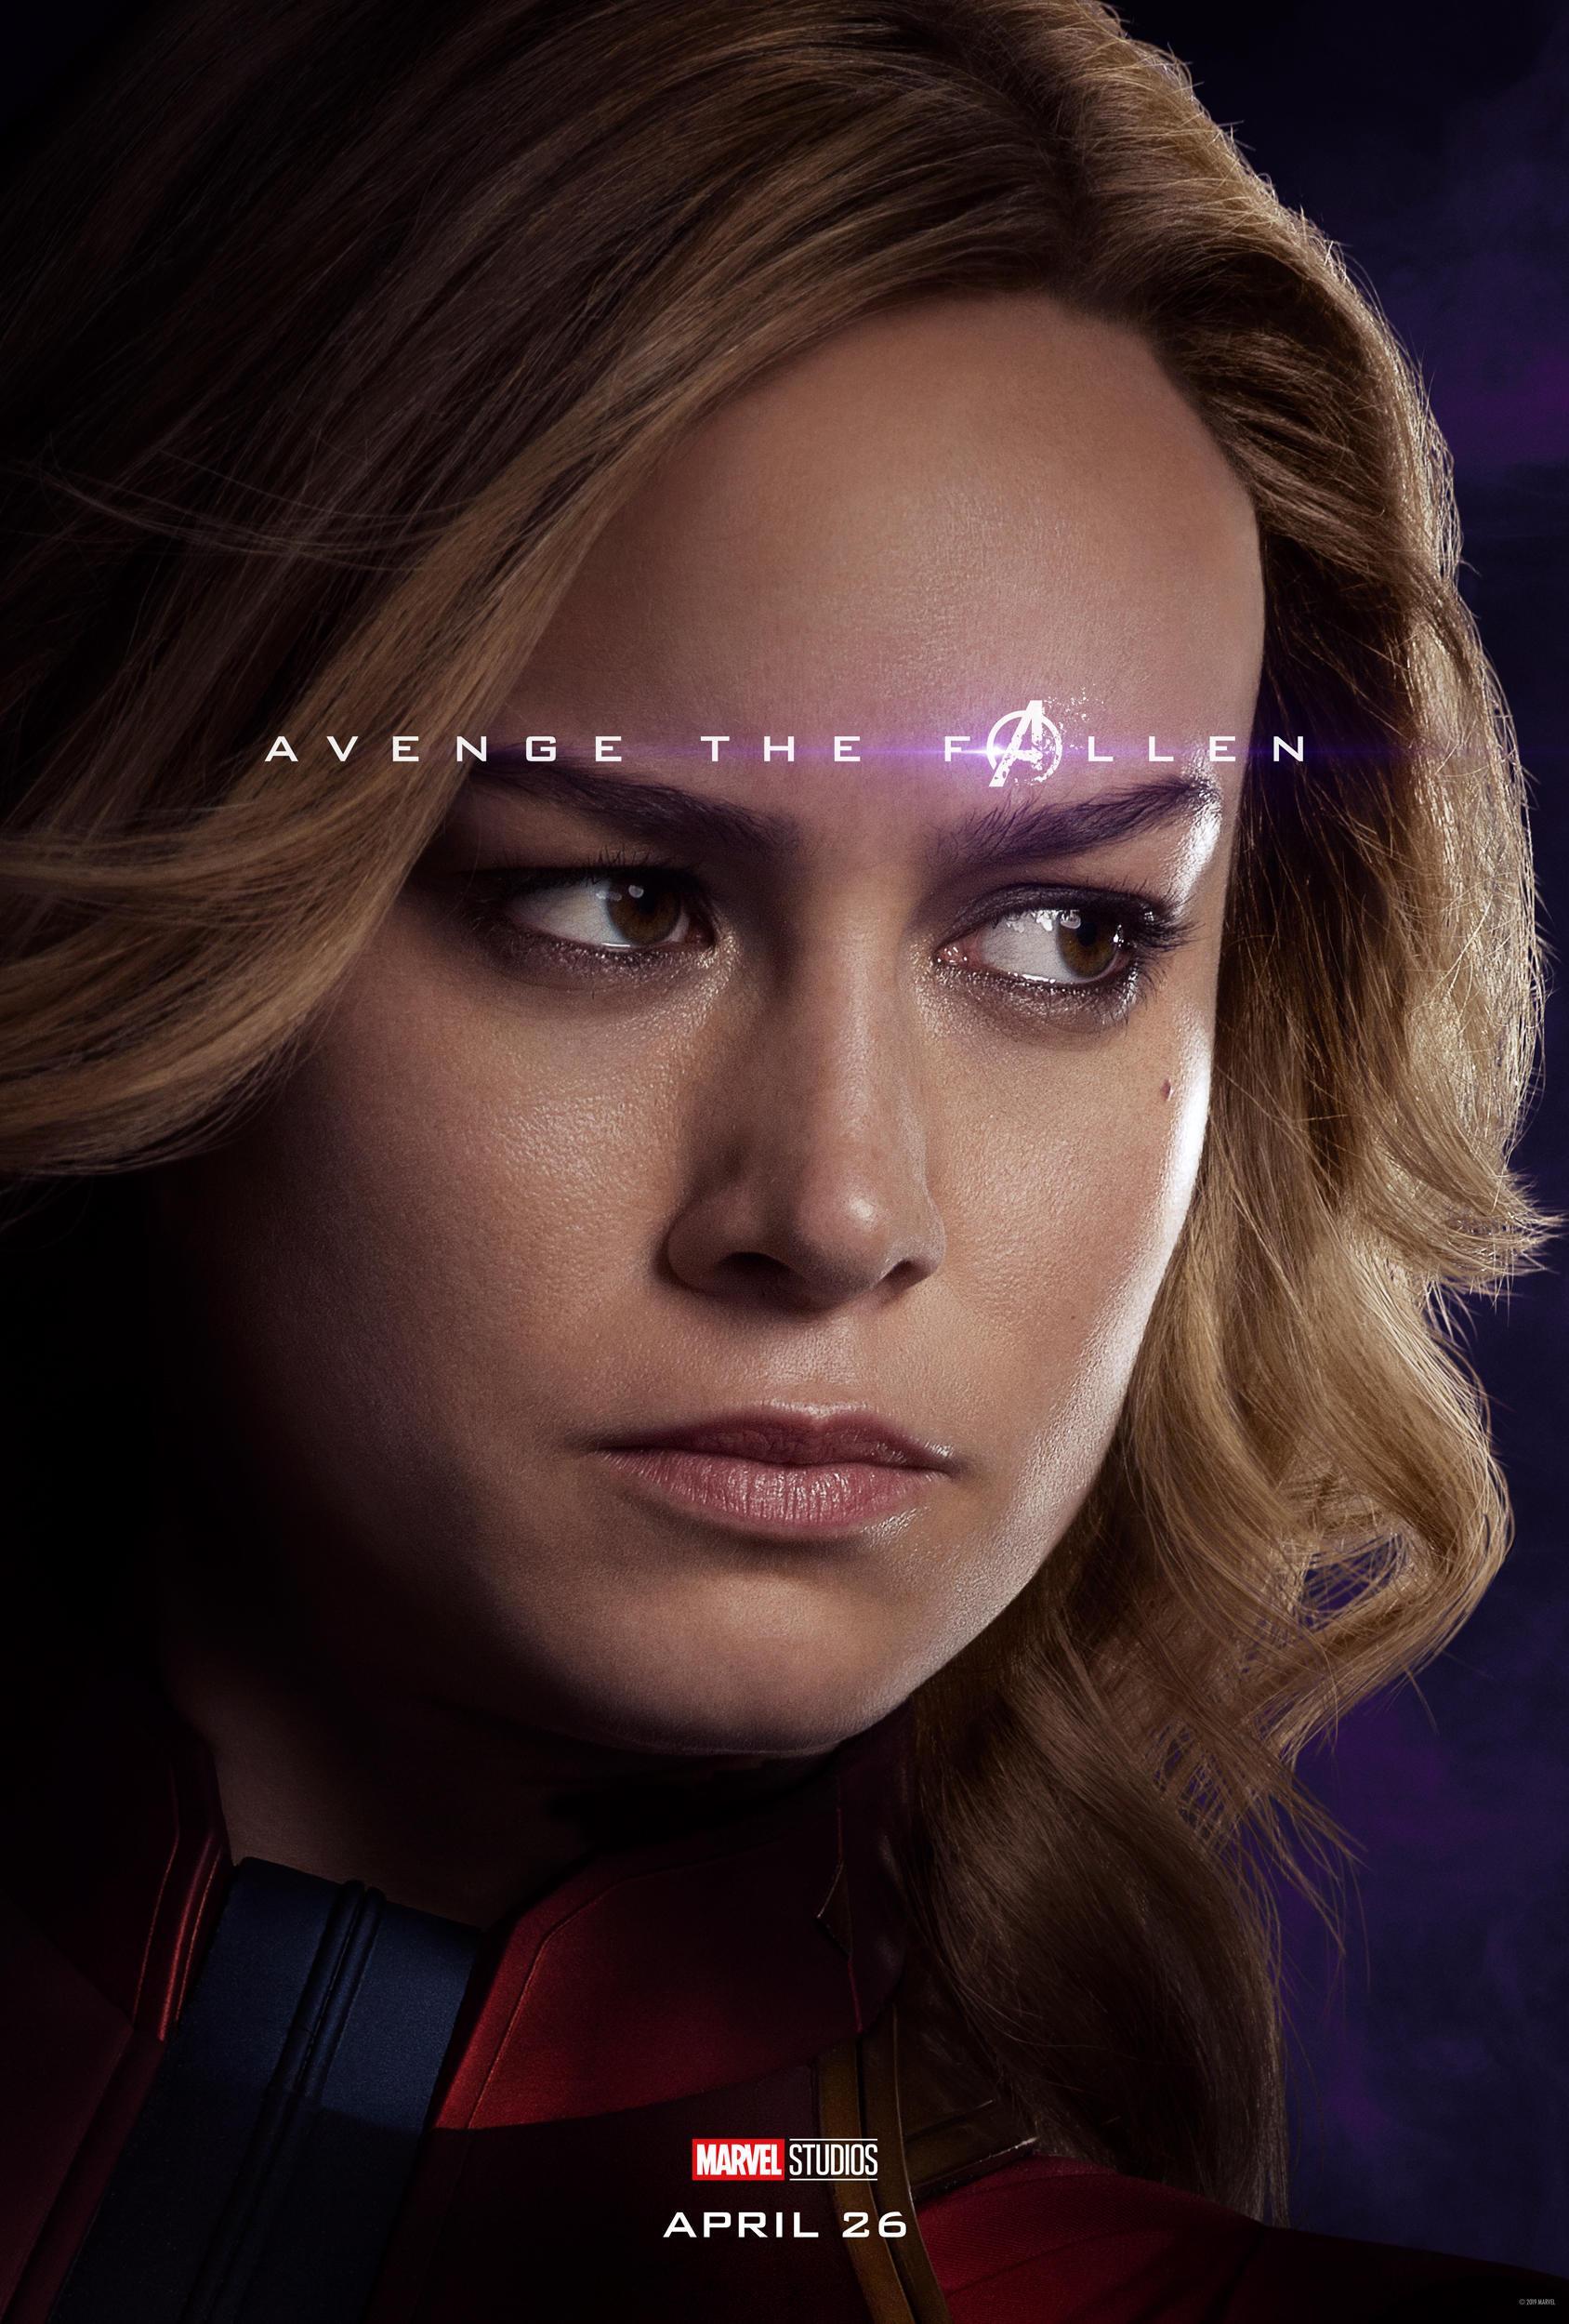 Avengers: Endgame (2019) - Financial Information